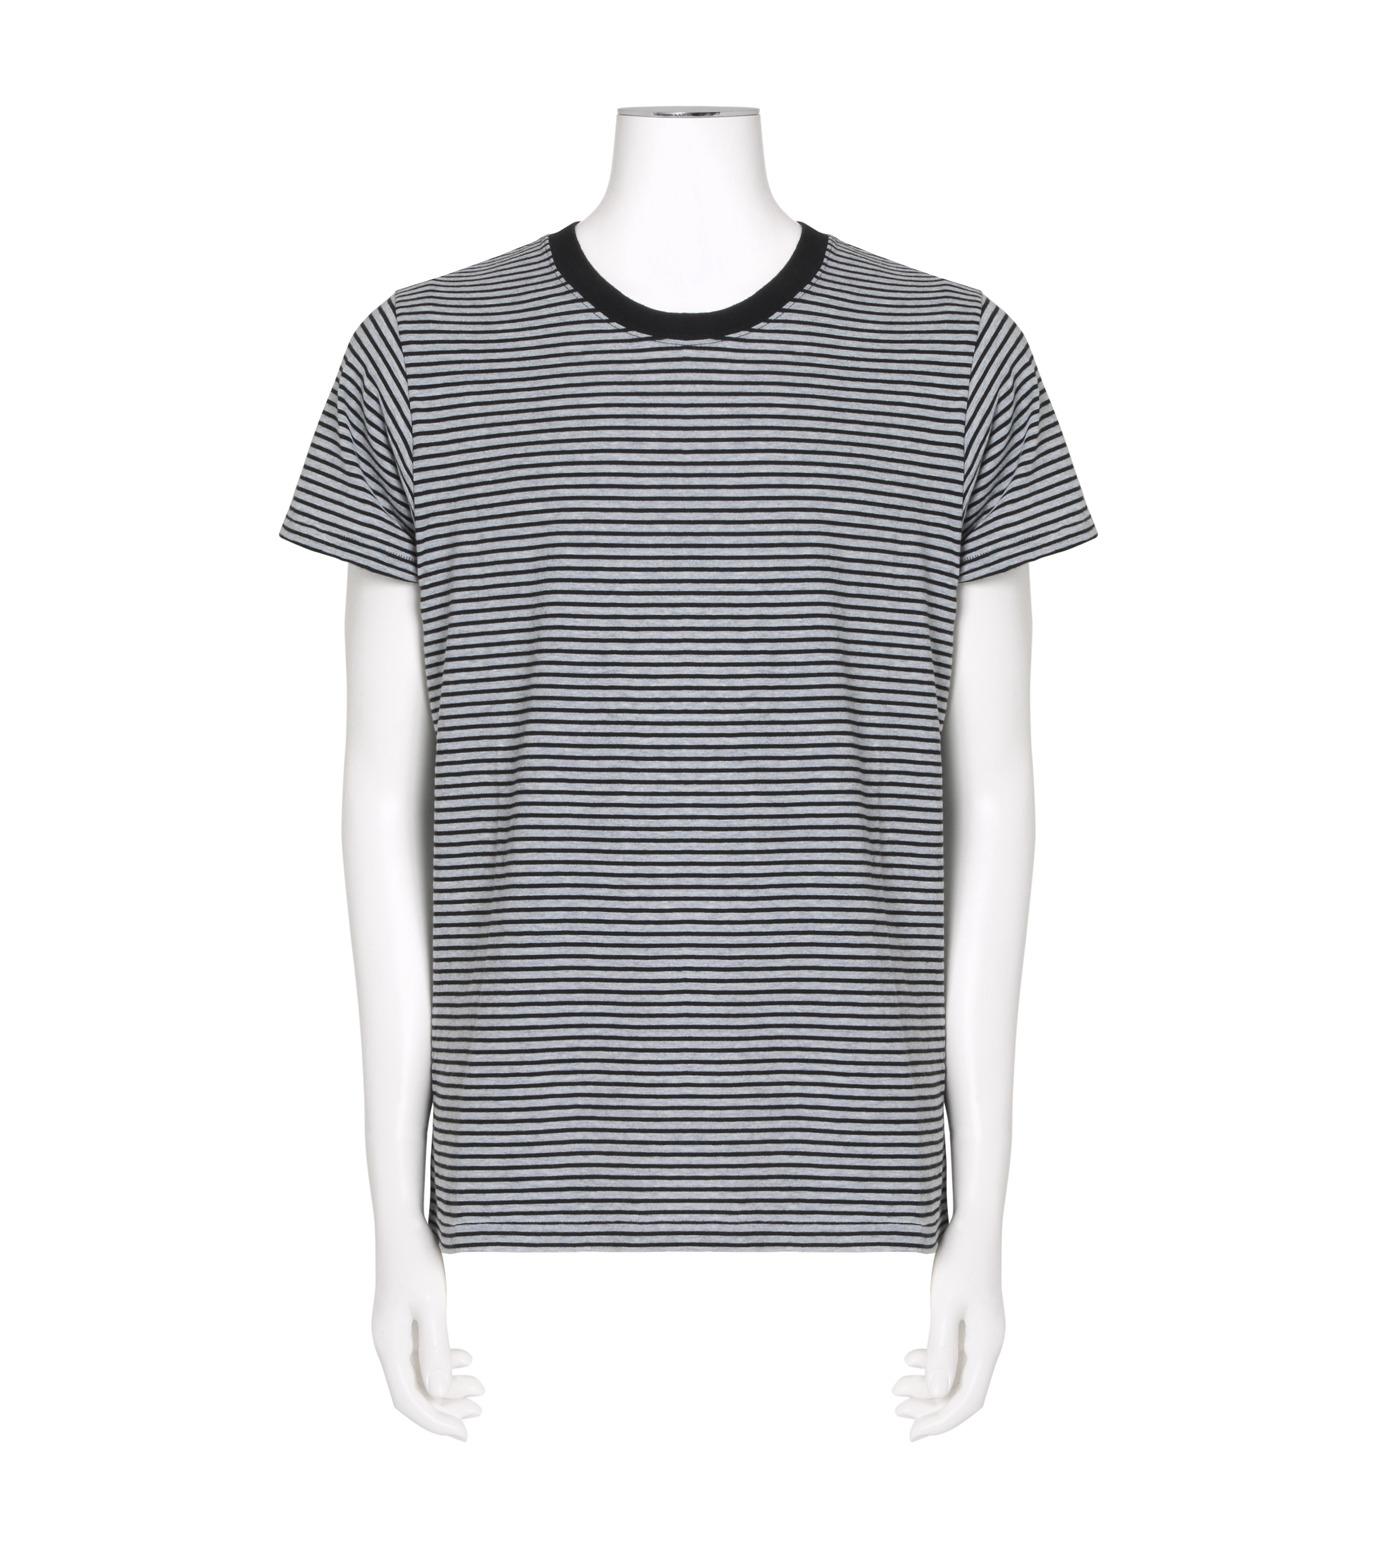 SAINT LAURENT(サンローラン)のBorder T-BLACK(カットソー/cut and sewn)-439488-Y2PG1-13 拡大詳細画像1